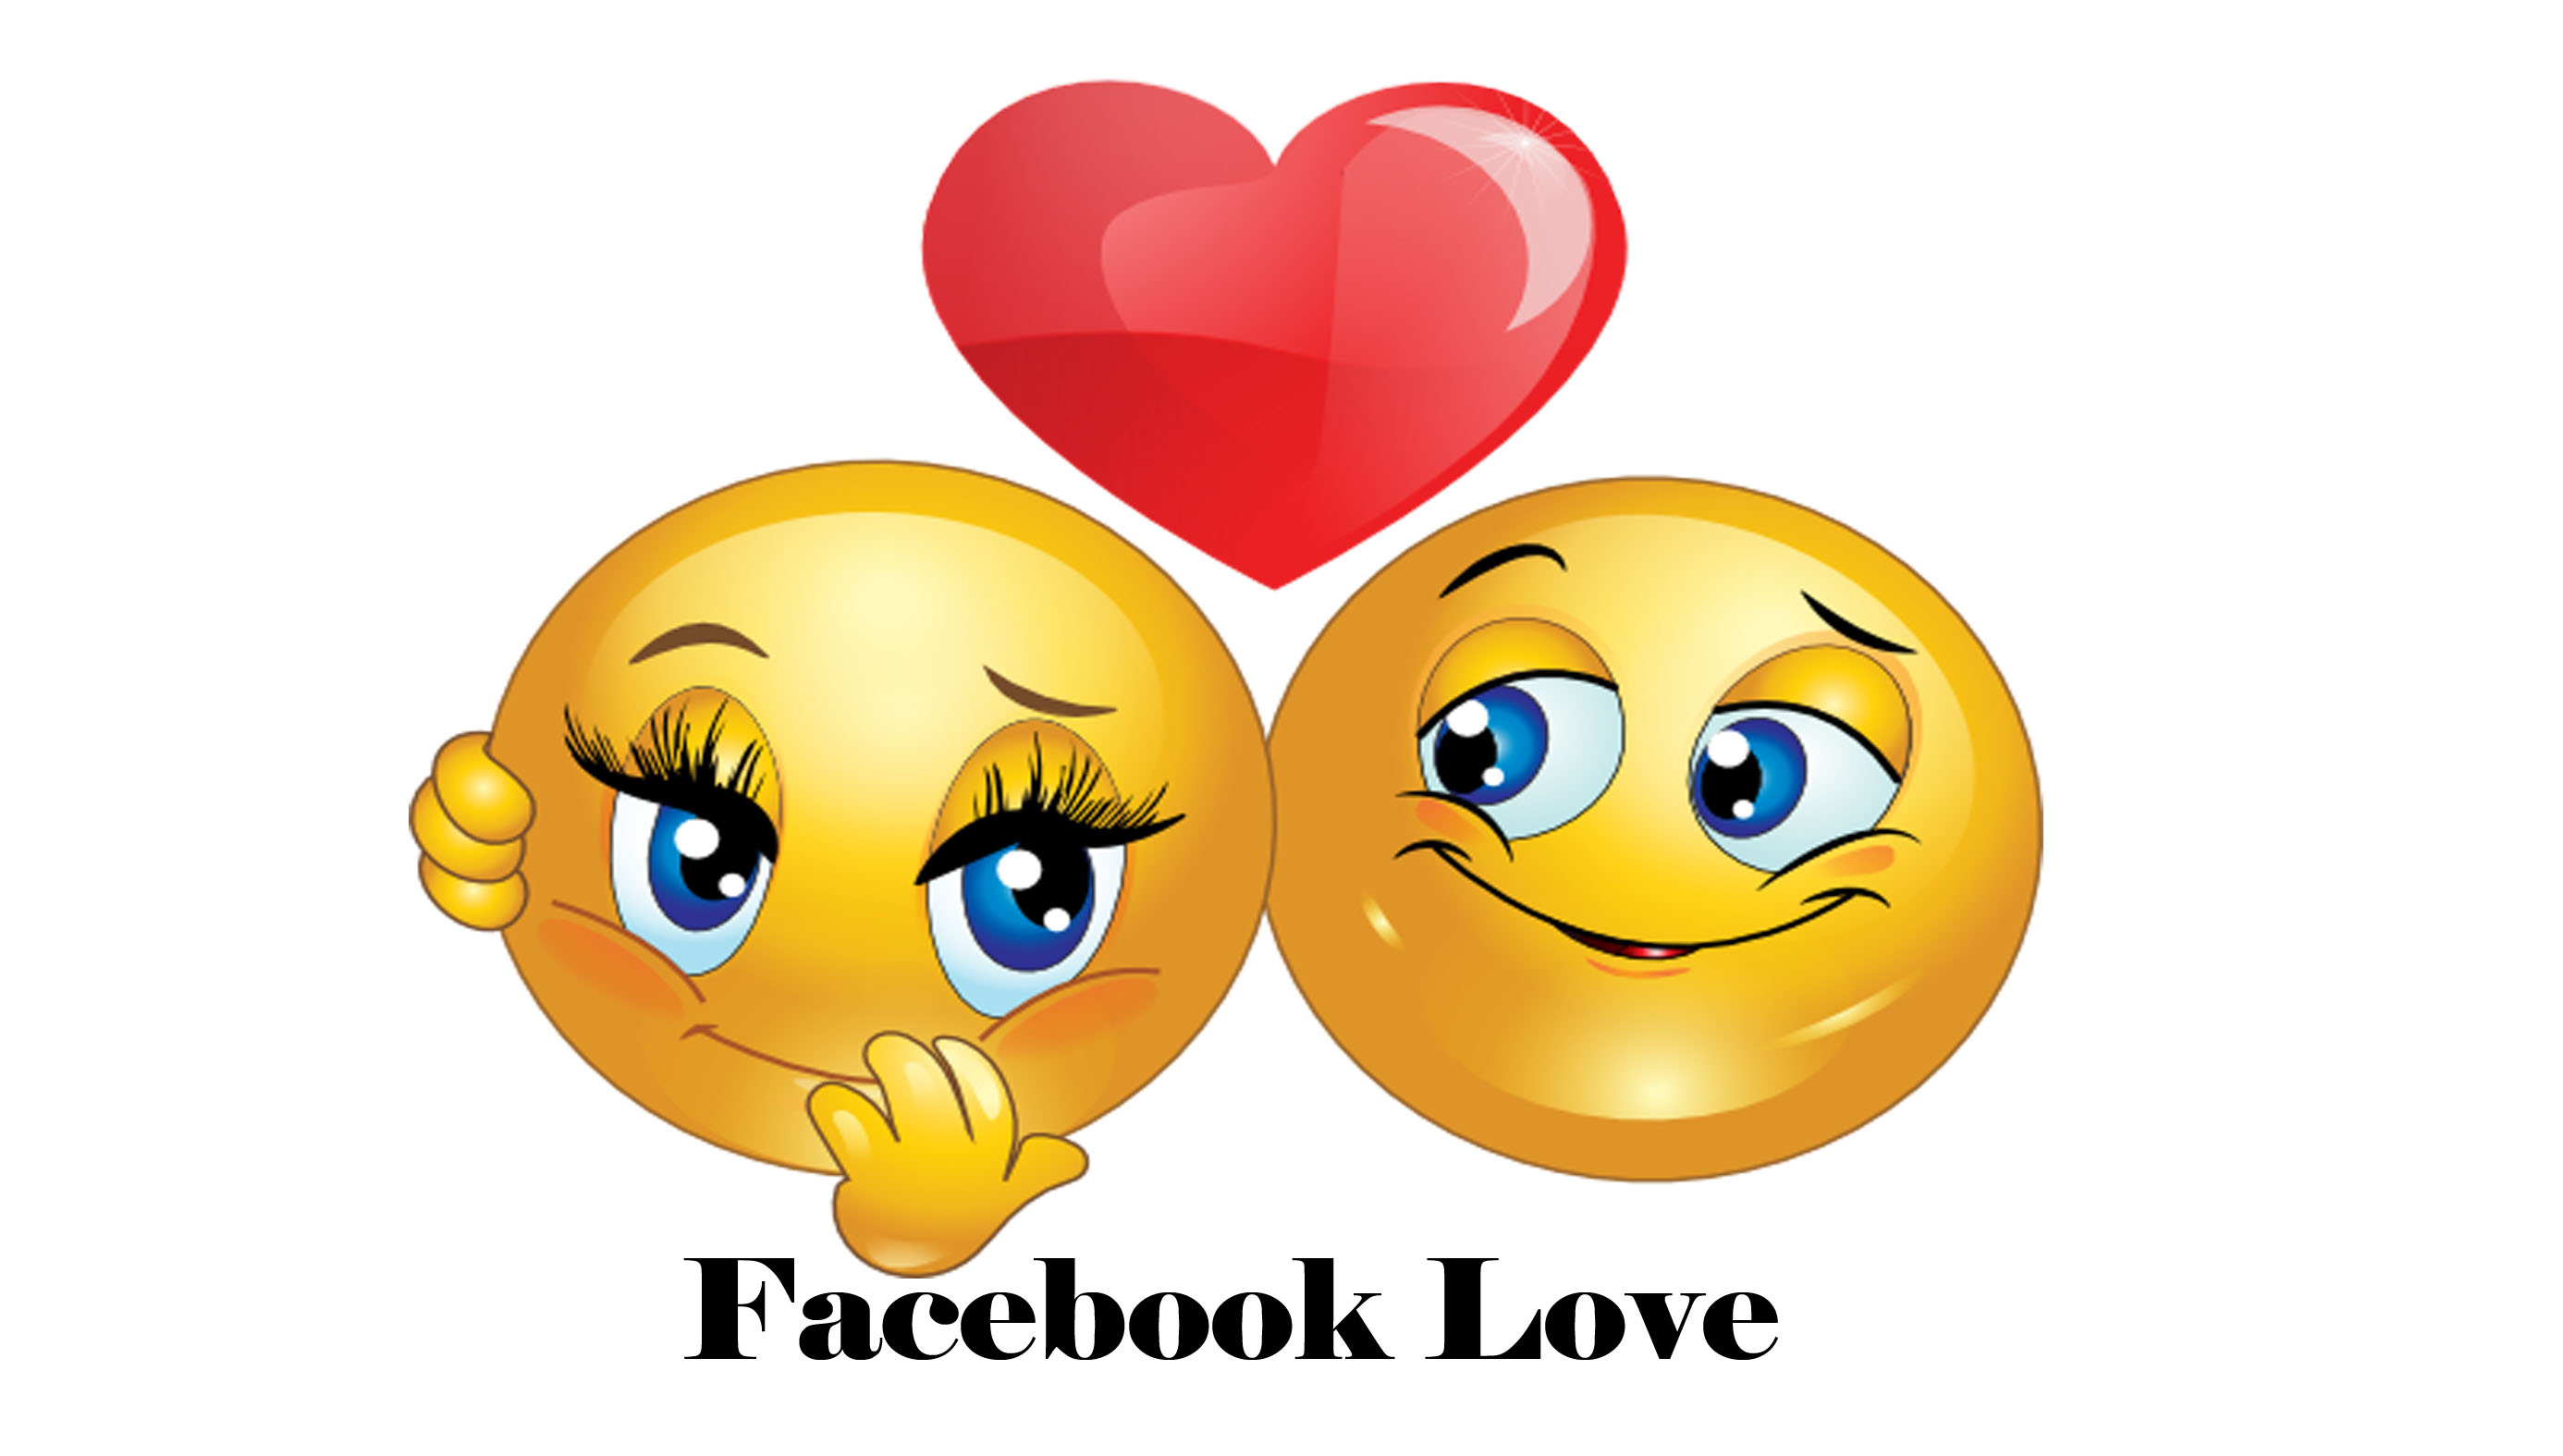 Facebook Love – Dating for Facebook